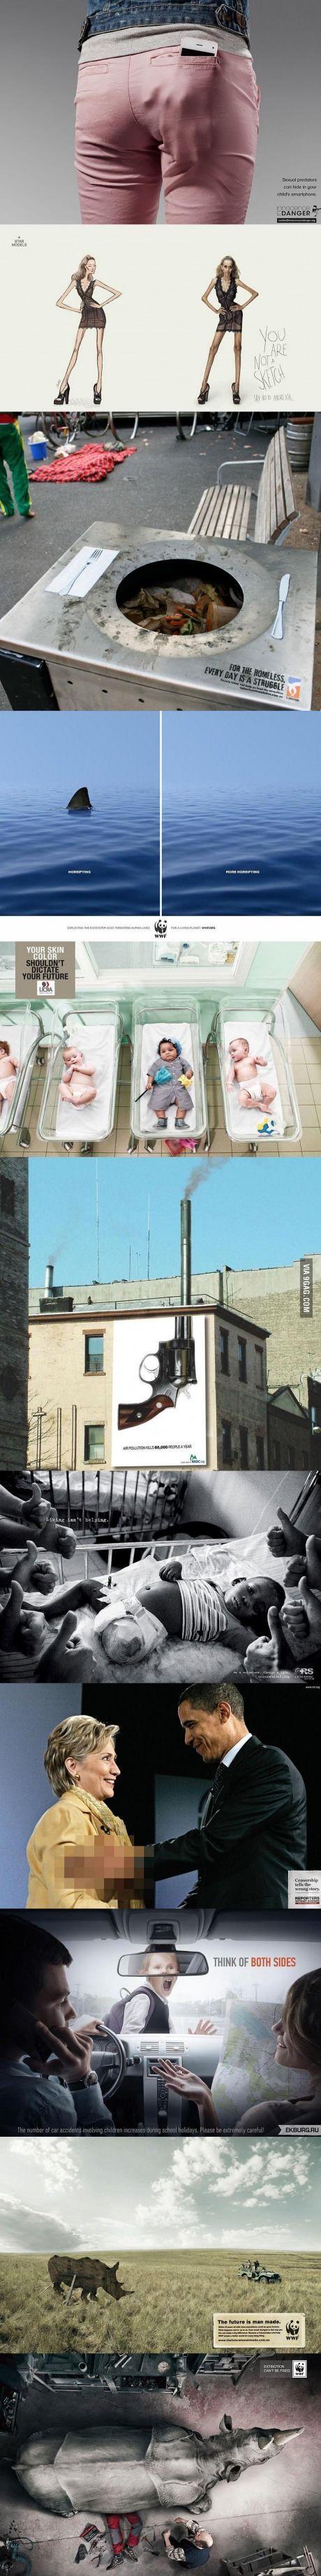 11 Brilliant Advertisements. Calgary marketing agency www.arcreactions.com